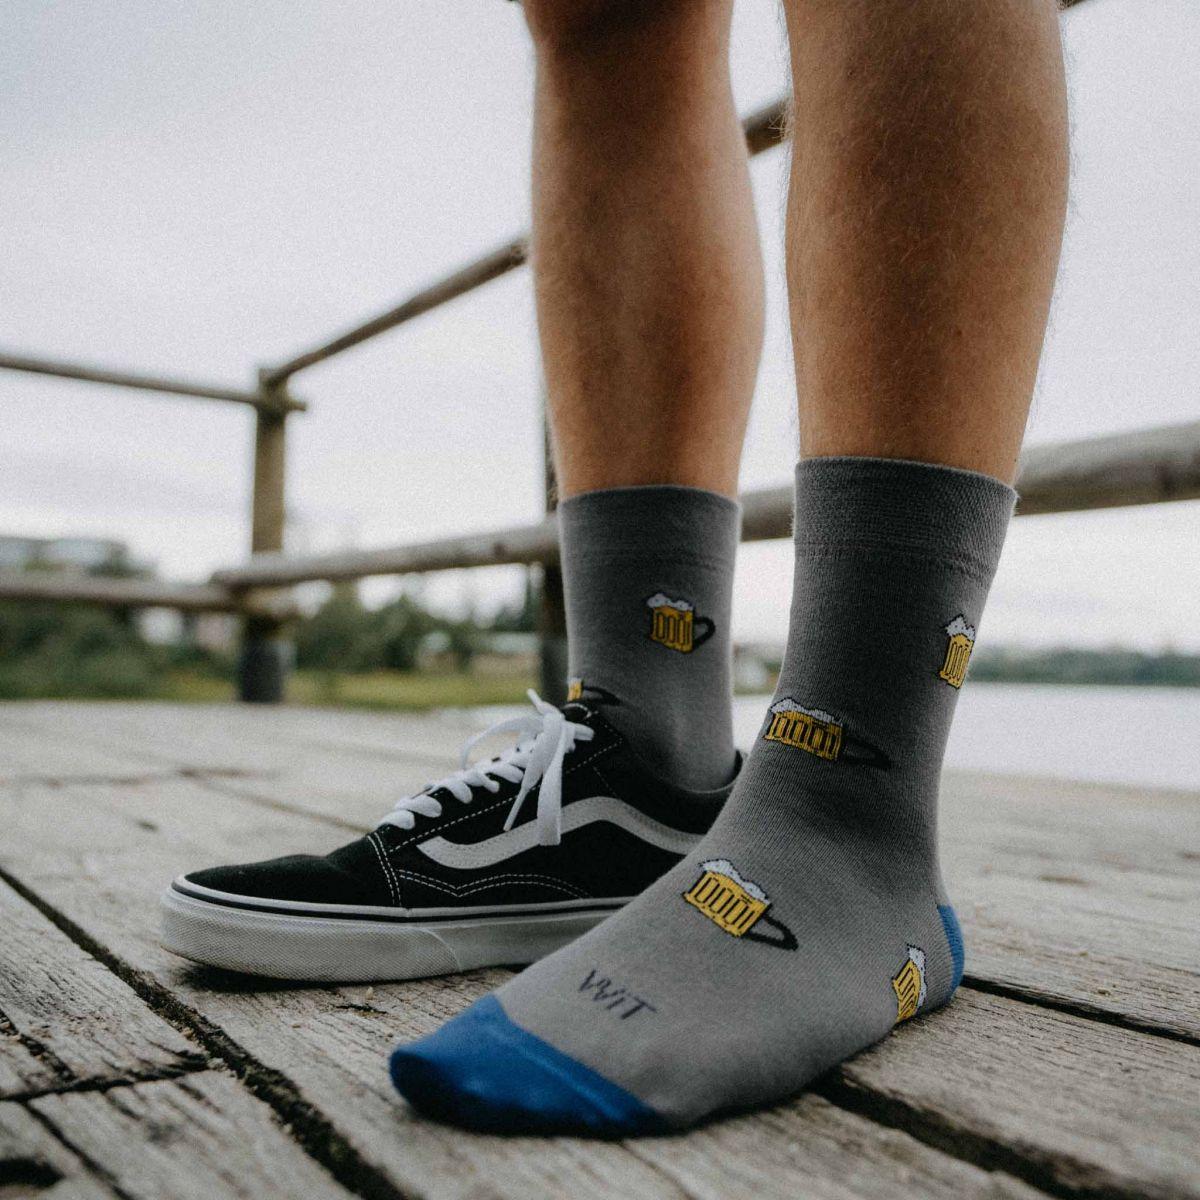 Ponožky - Pivo 2 p2